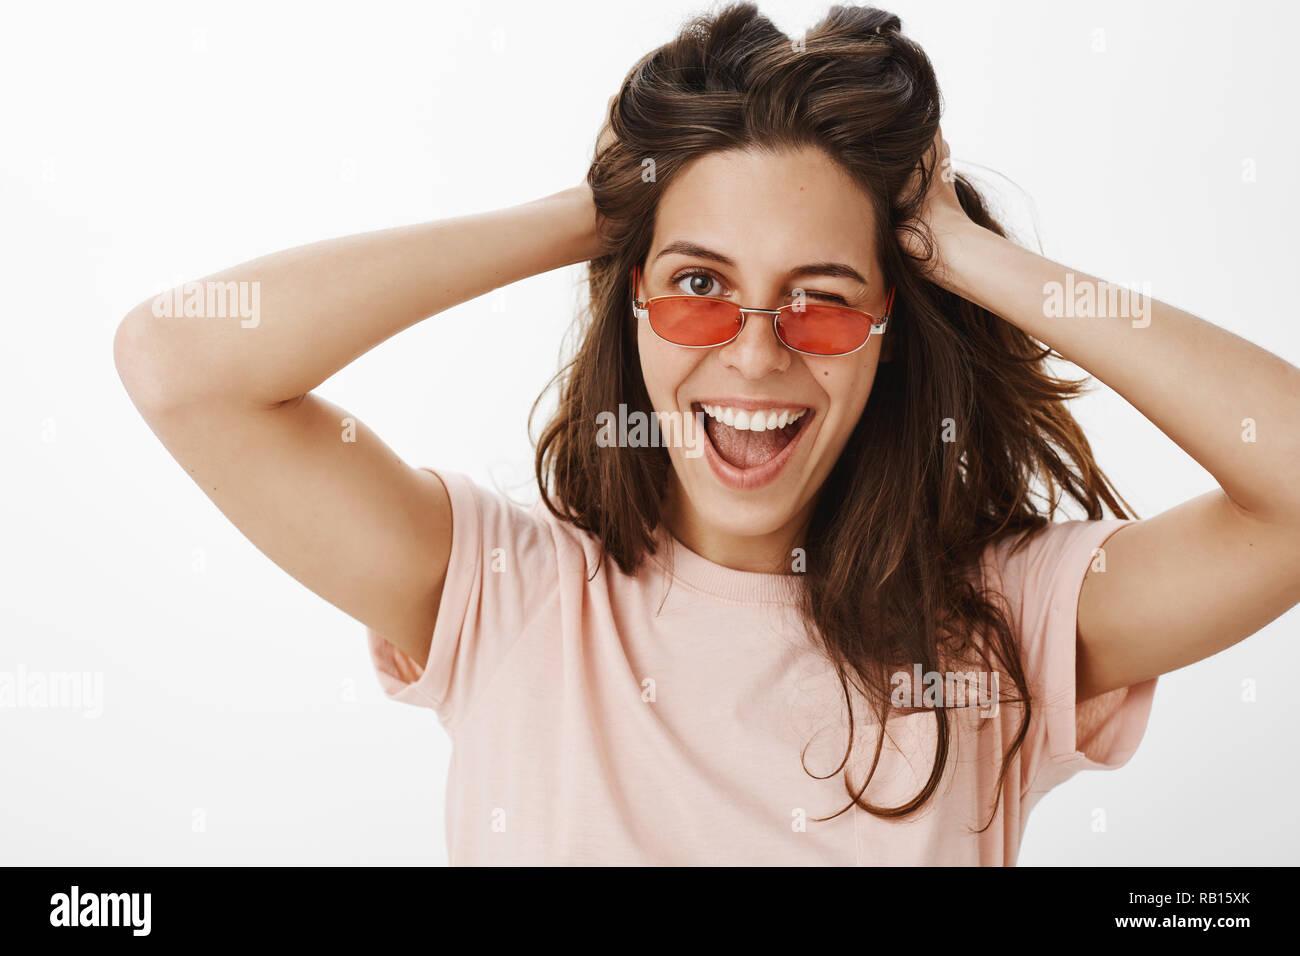 c38be9e5c0f Hey look on bright side. Portrait of charming stylish and confident  euroepan female winking joyfully